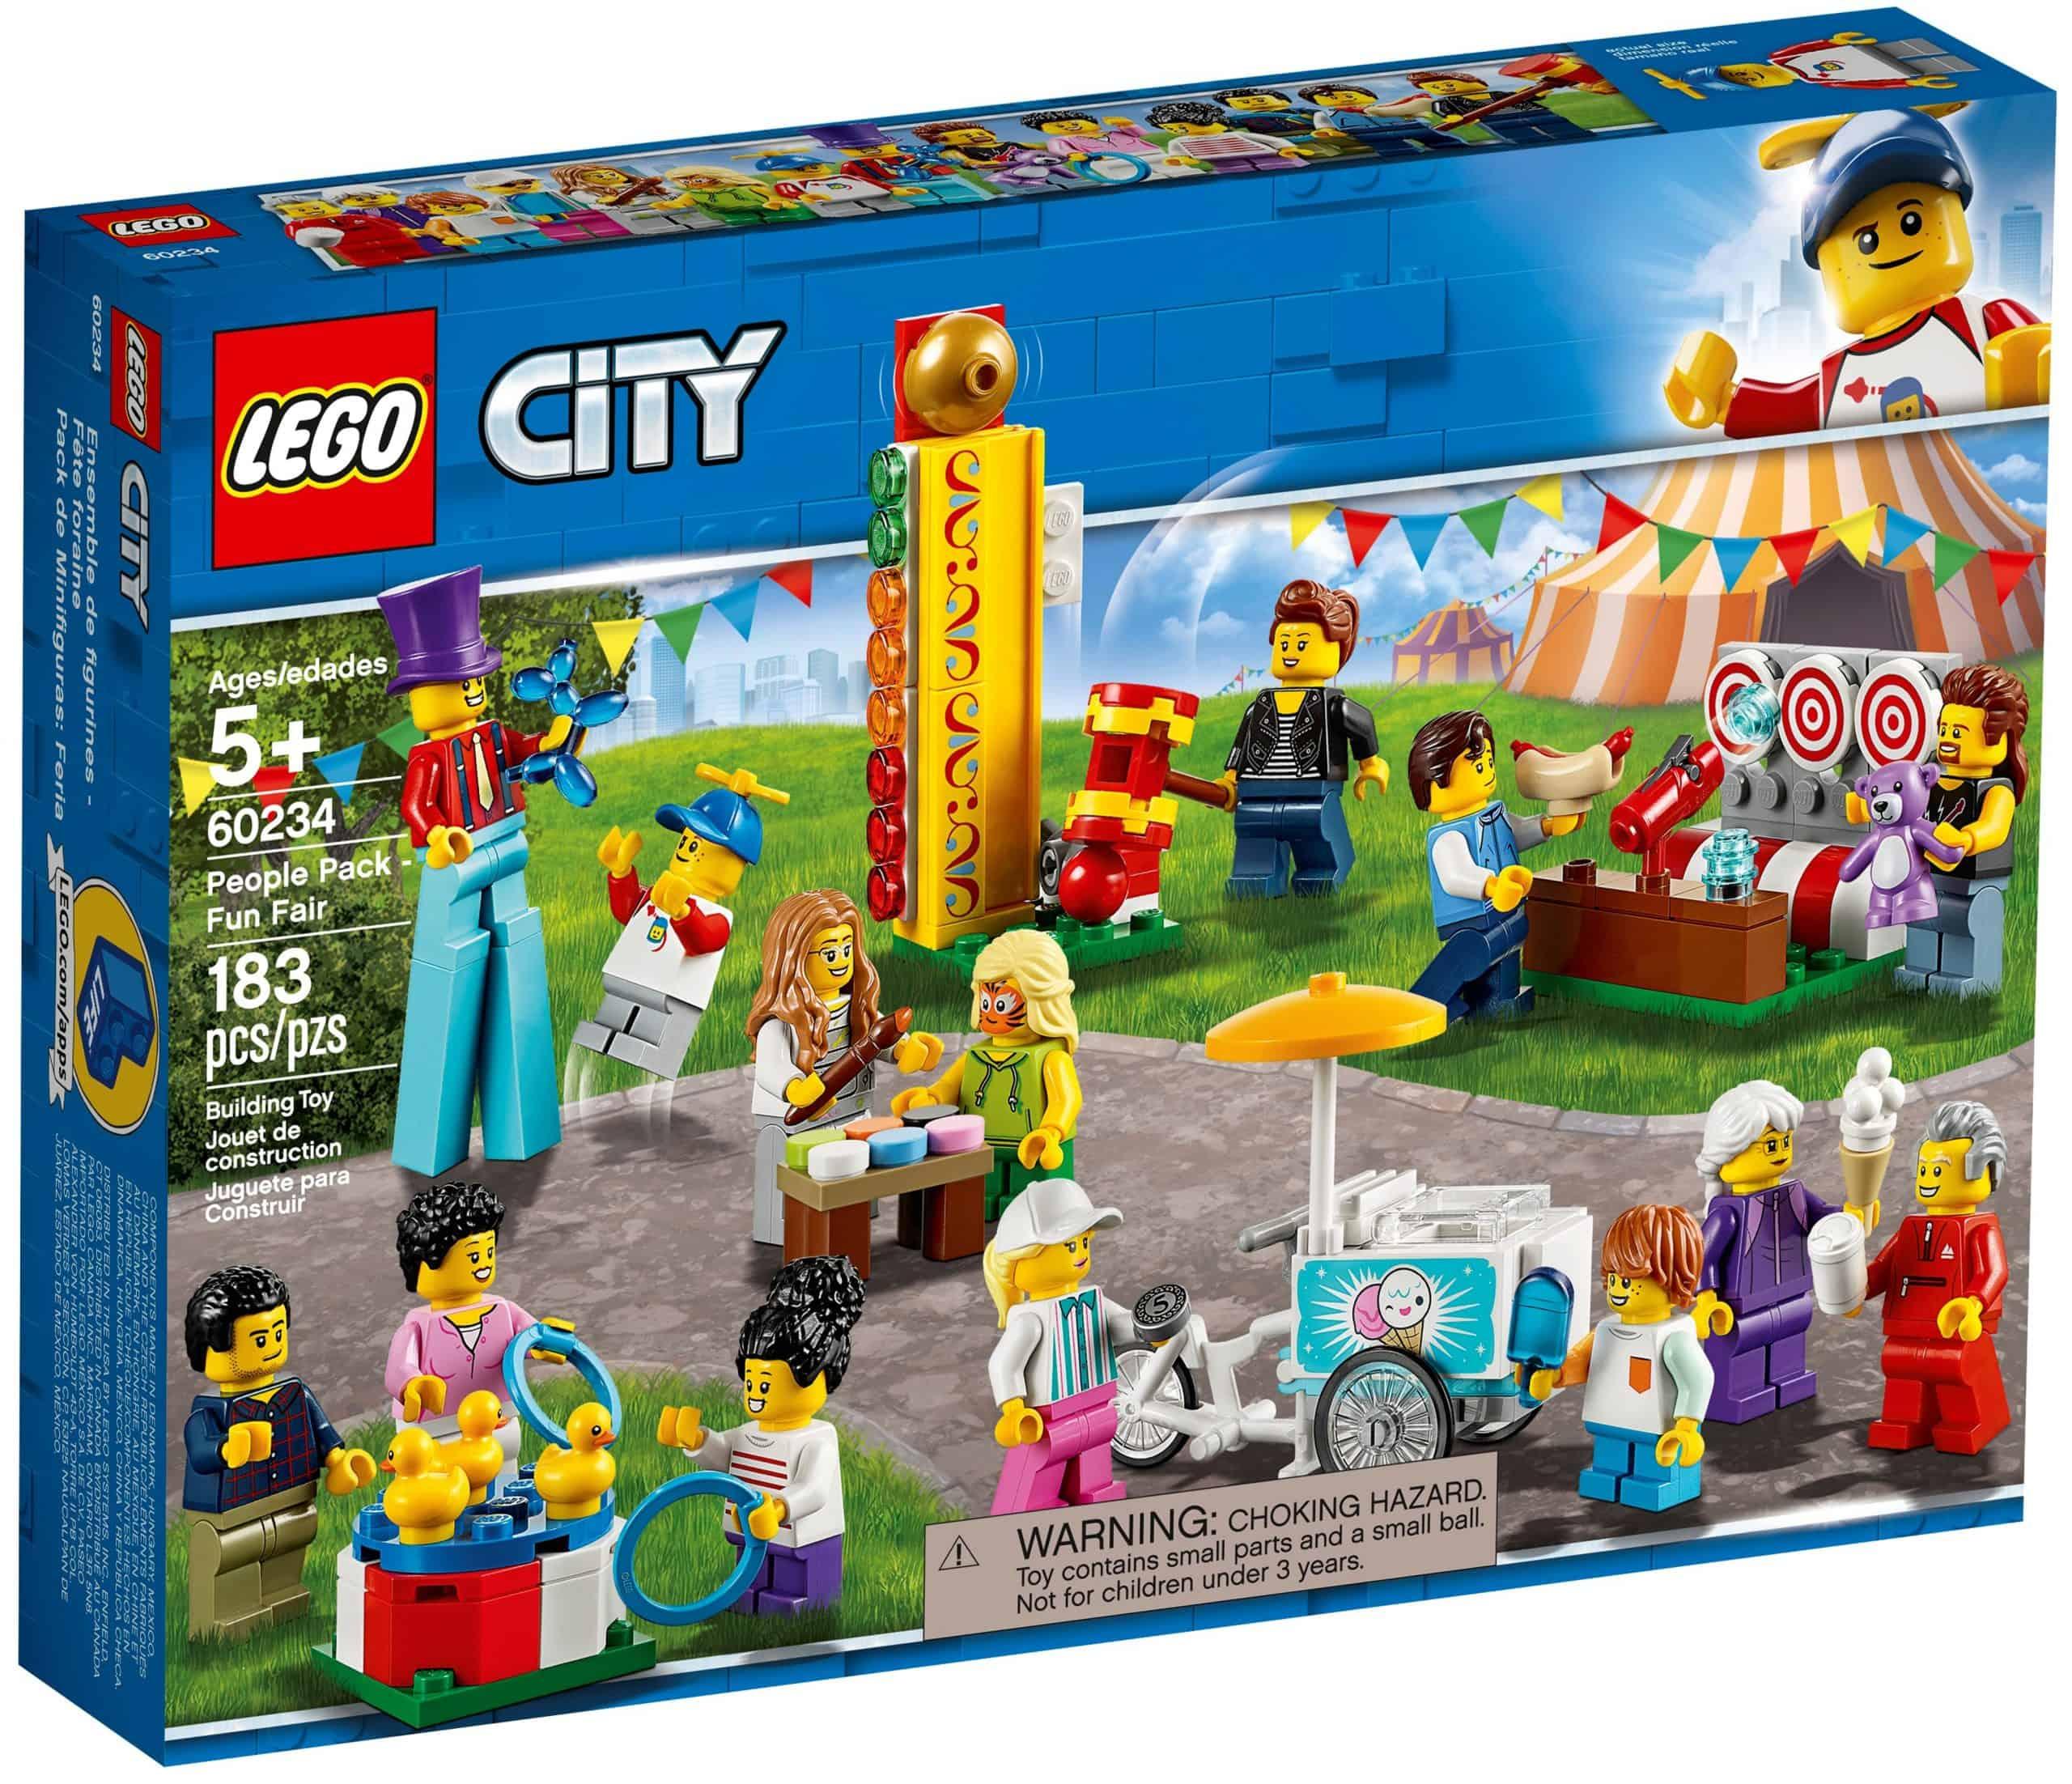 lego 60234 figursaet forlystelsespark scaled